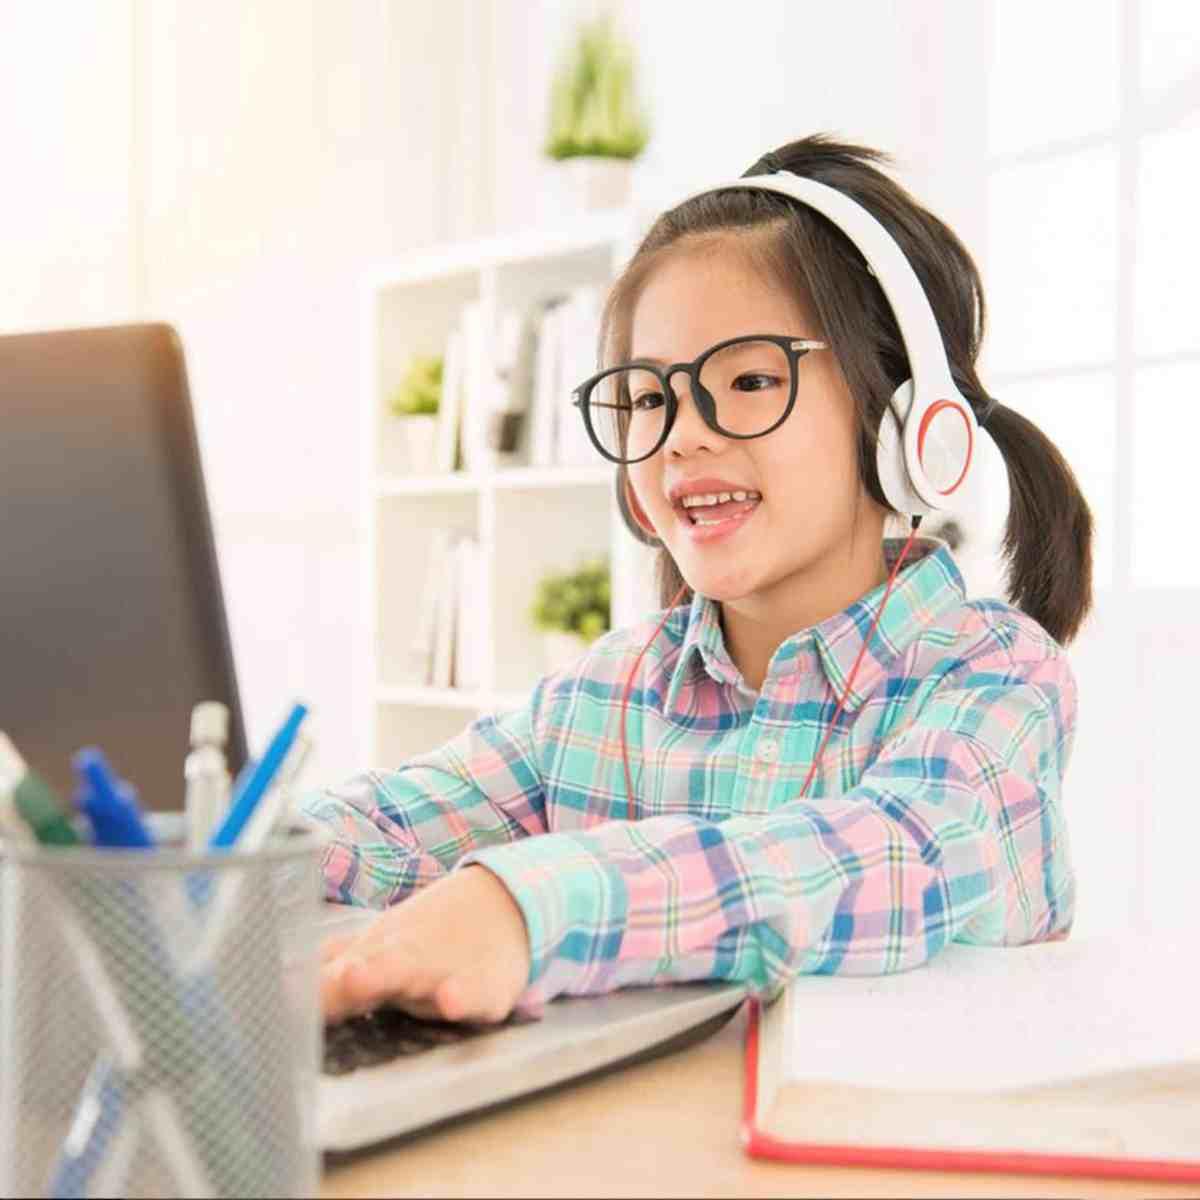 online math tutor academic k-12